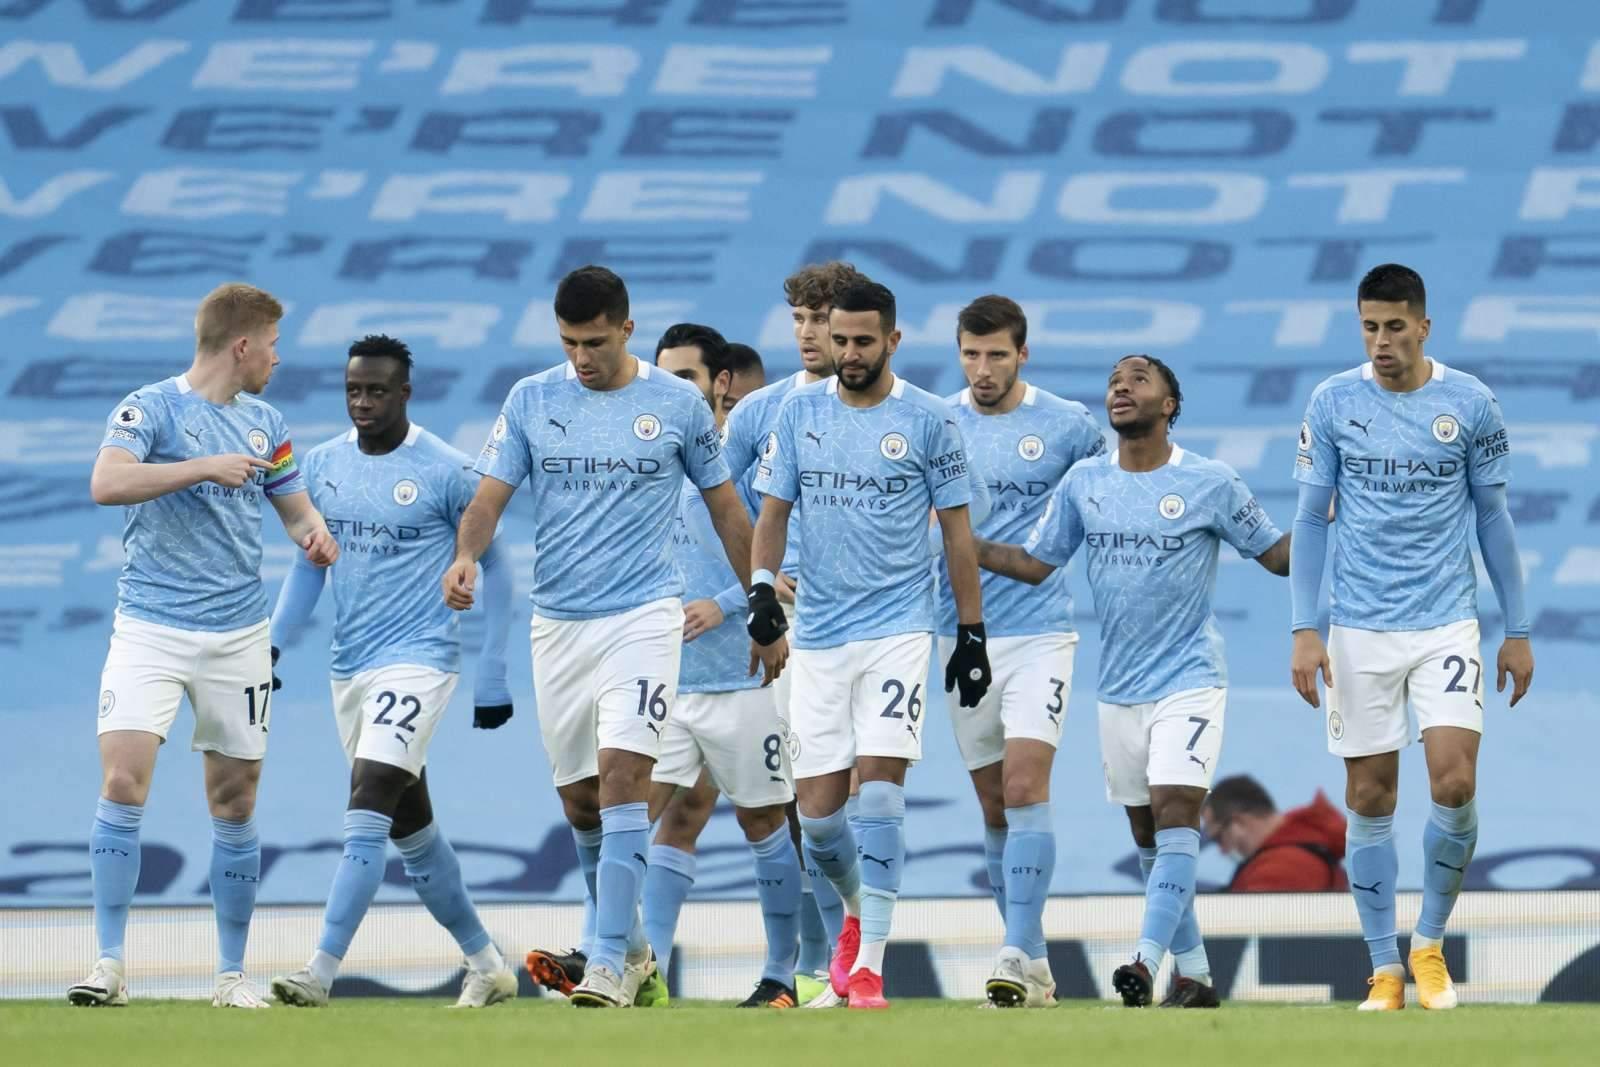 «Манчестер Сити» - «Кристал Пэлас»: прогноз на матч чемпионата Англии – 17 января 2021